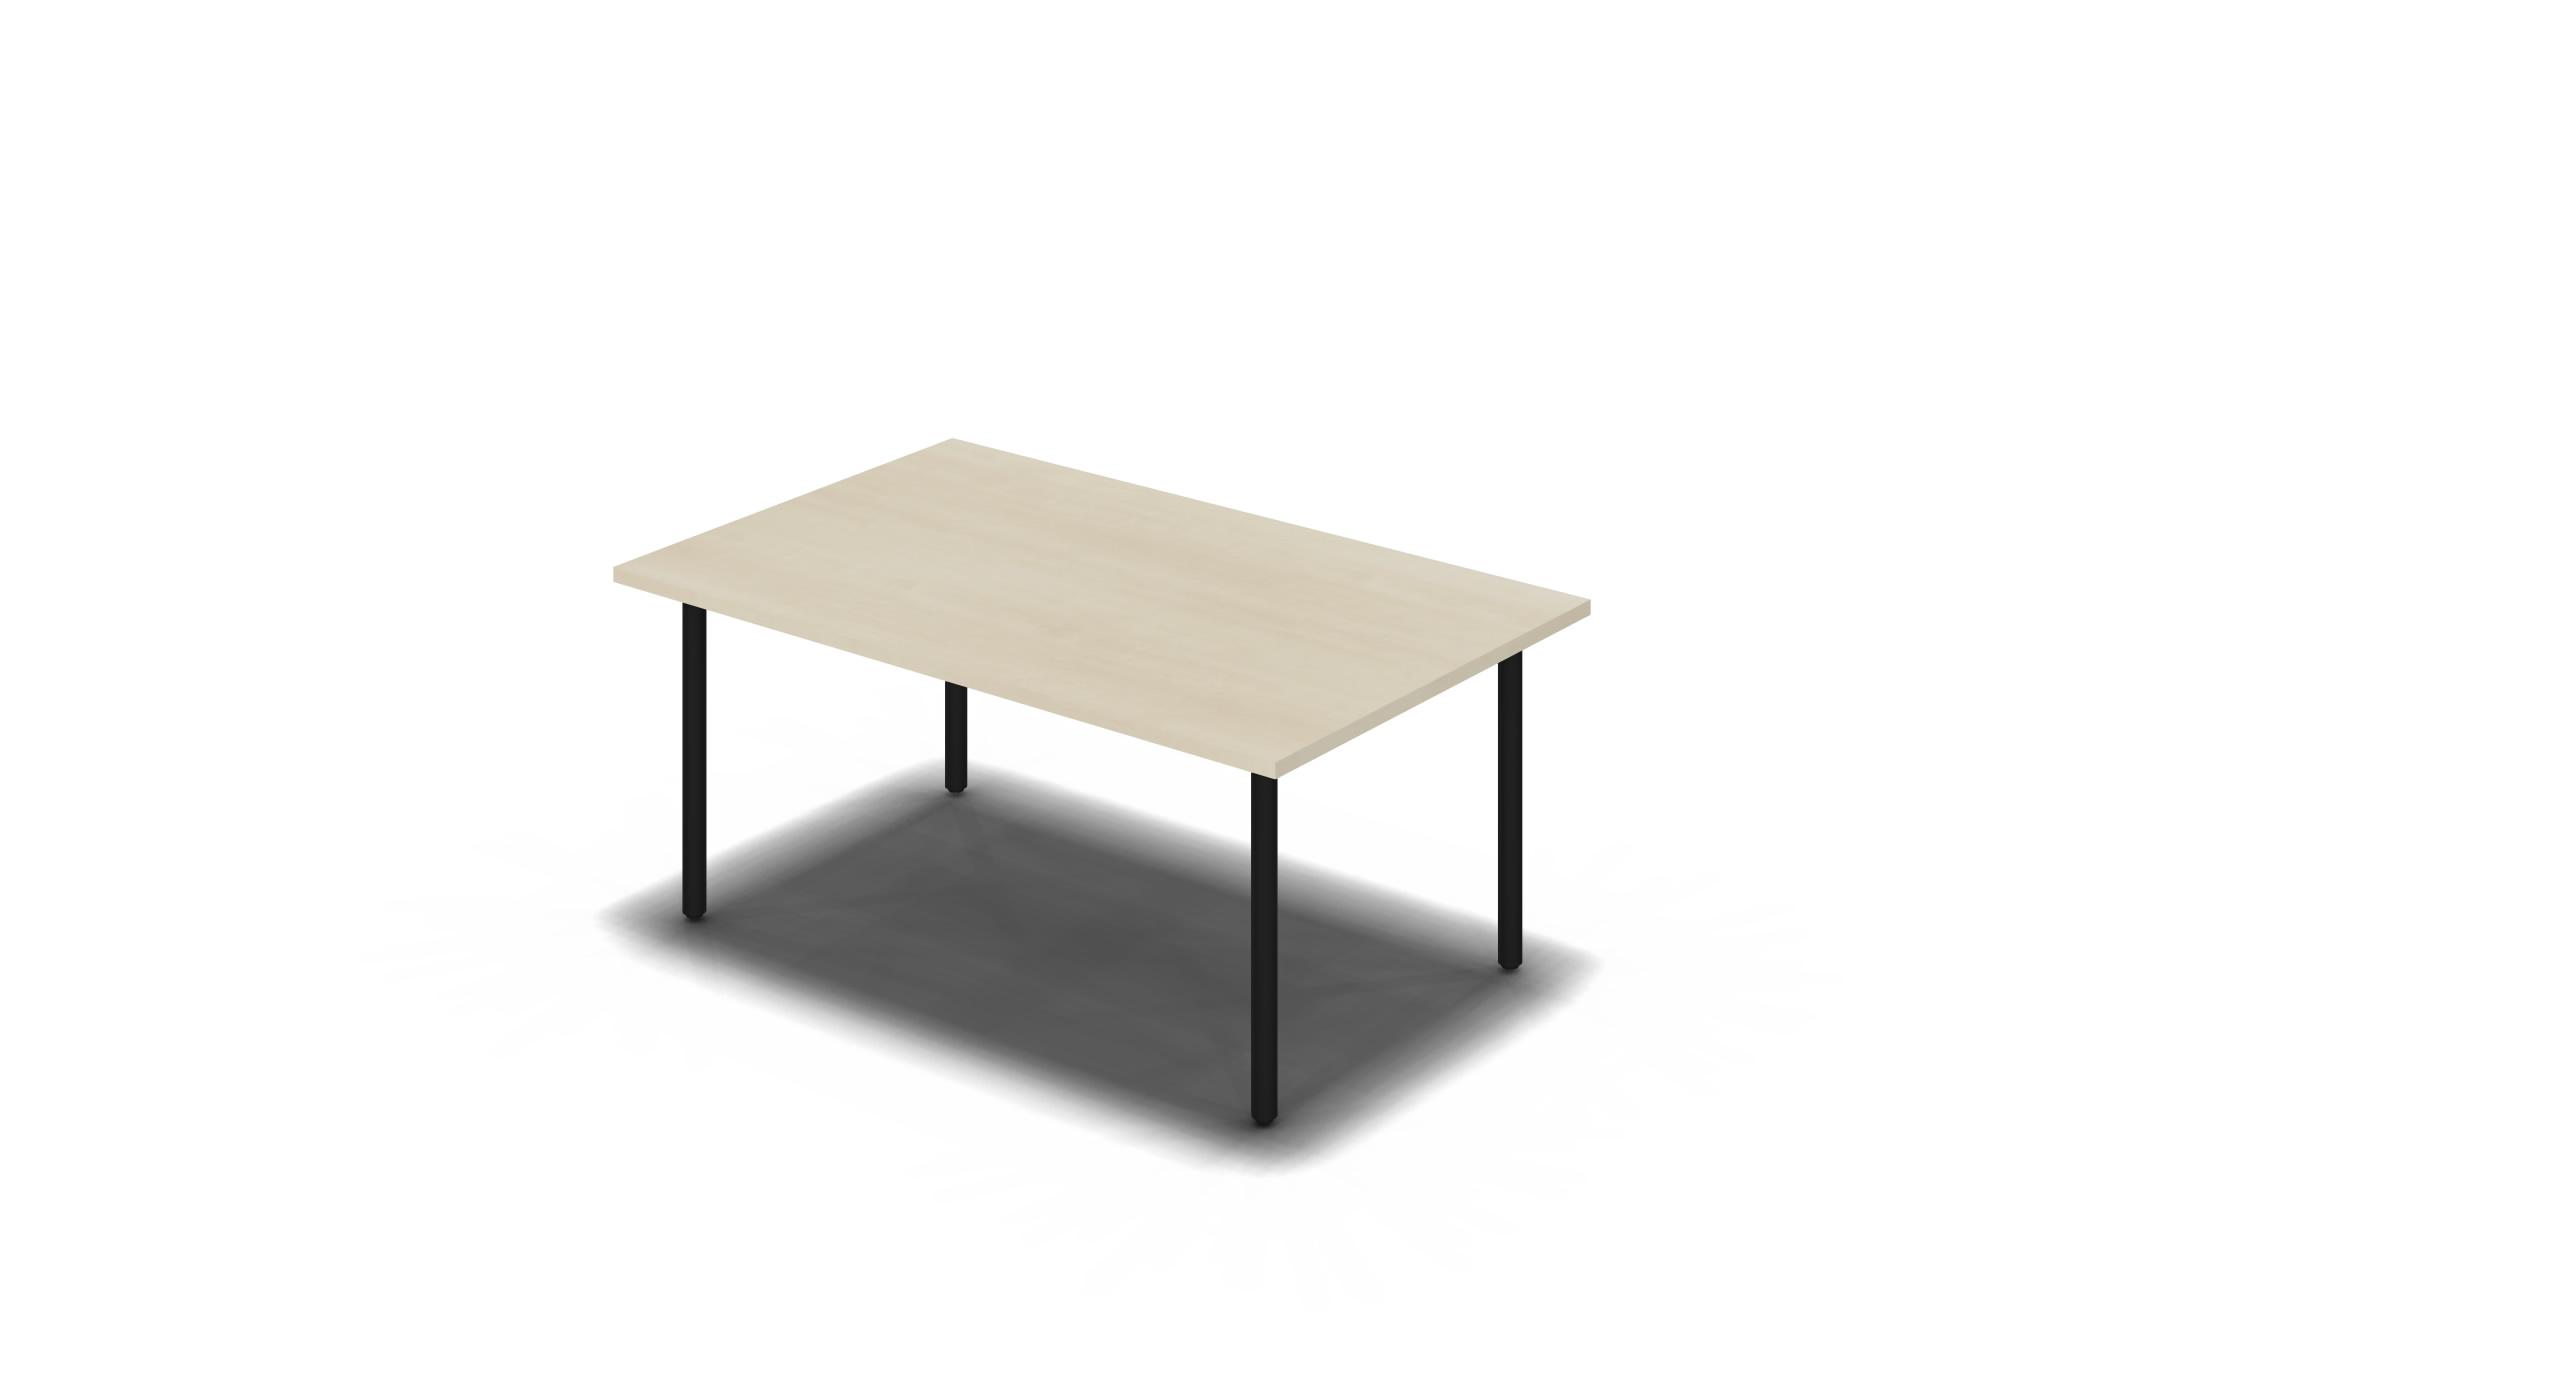 Table_Round_1500x900_Black_Maple_noOption